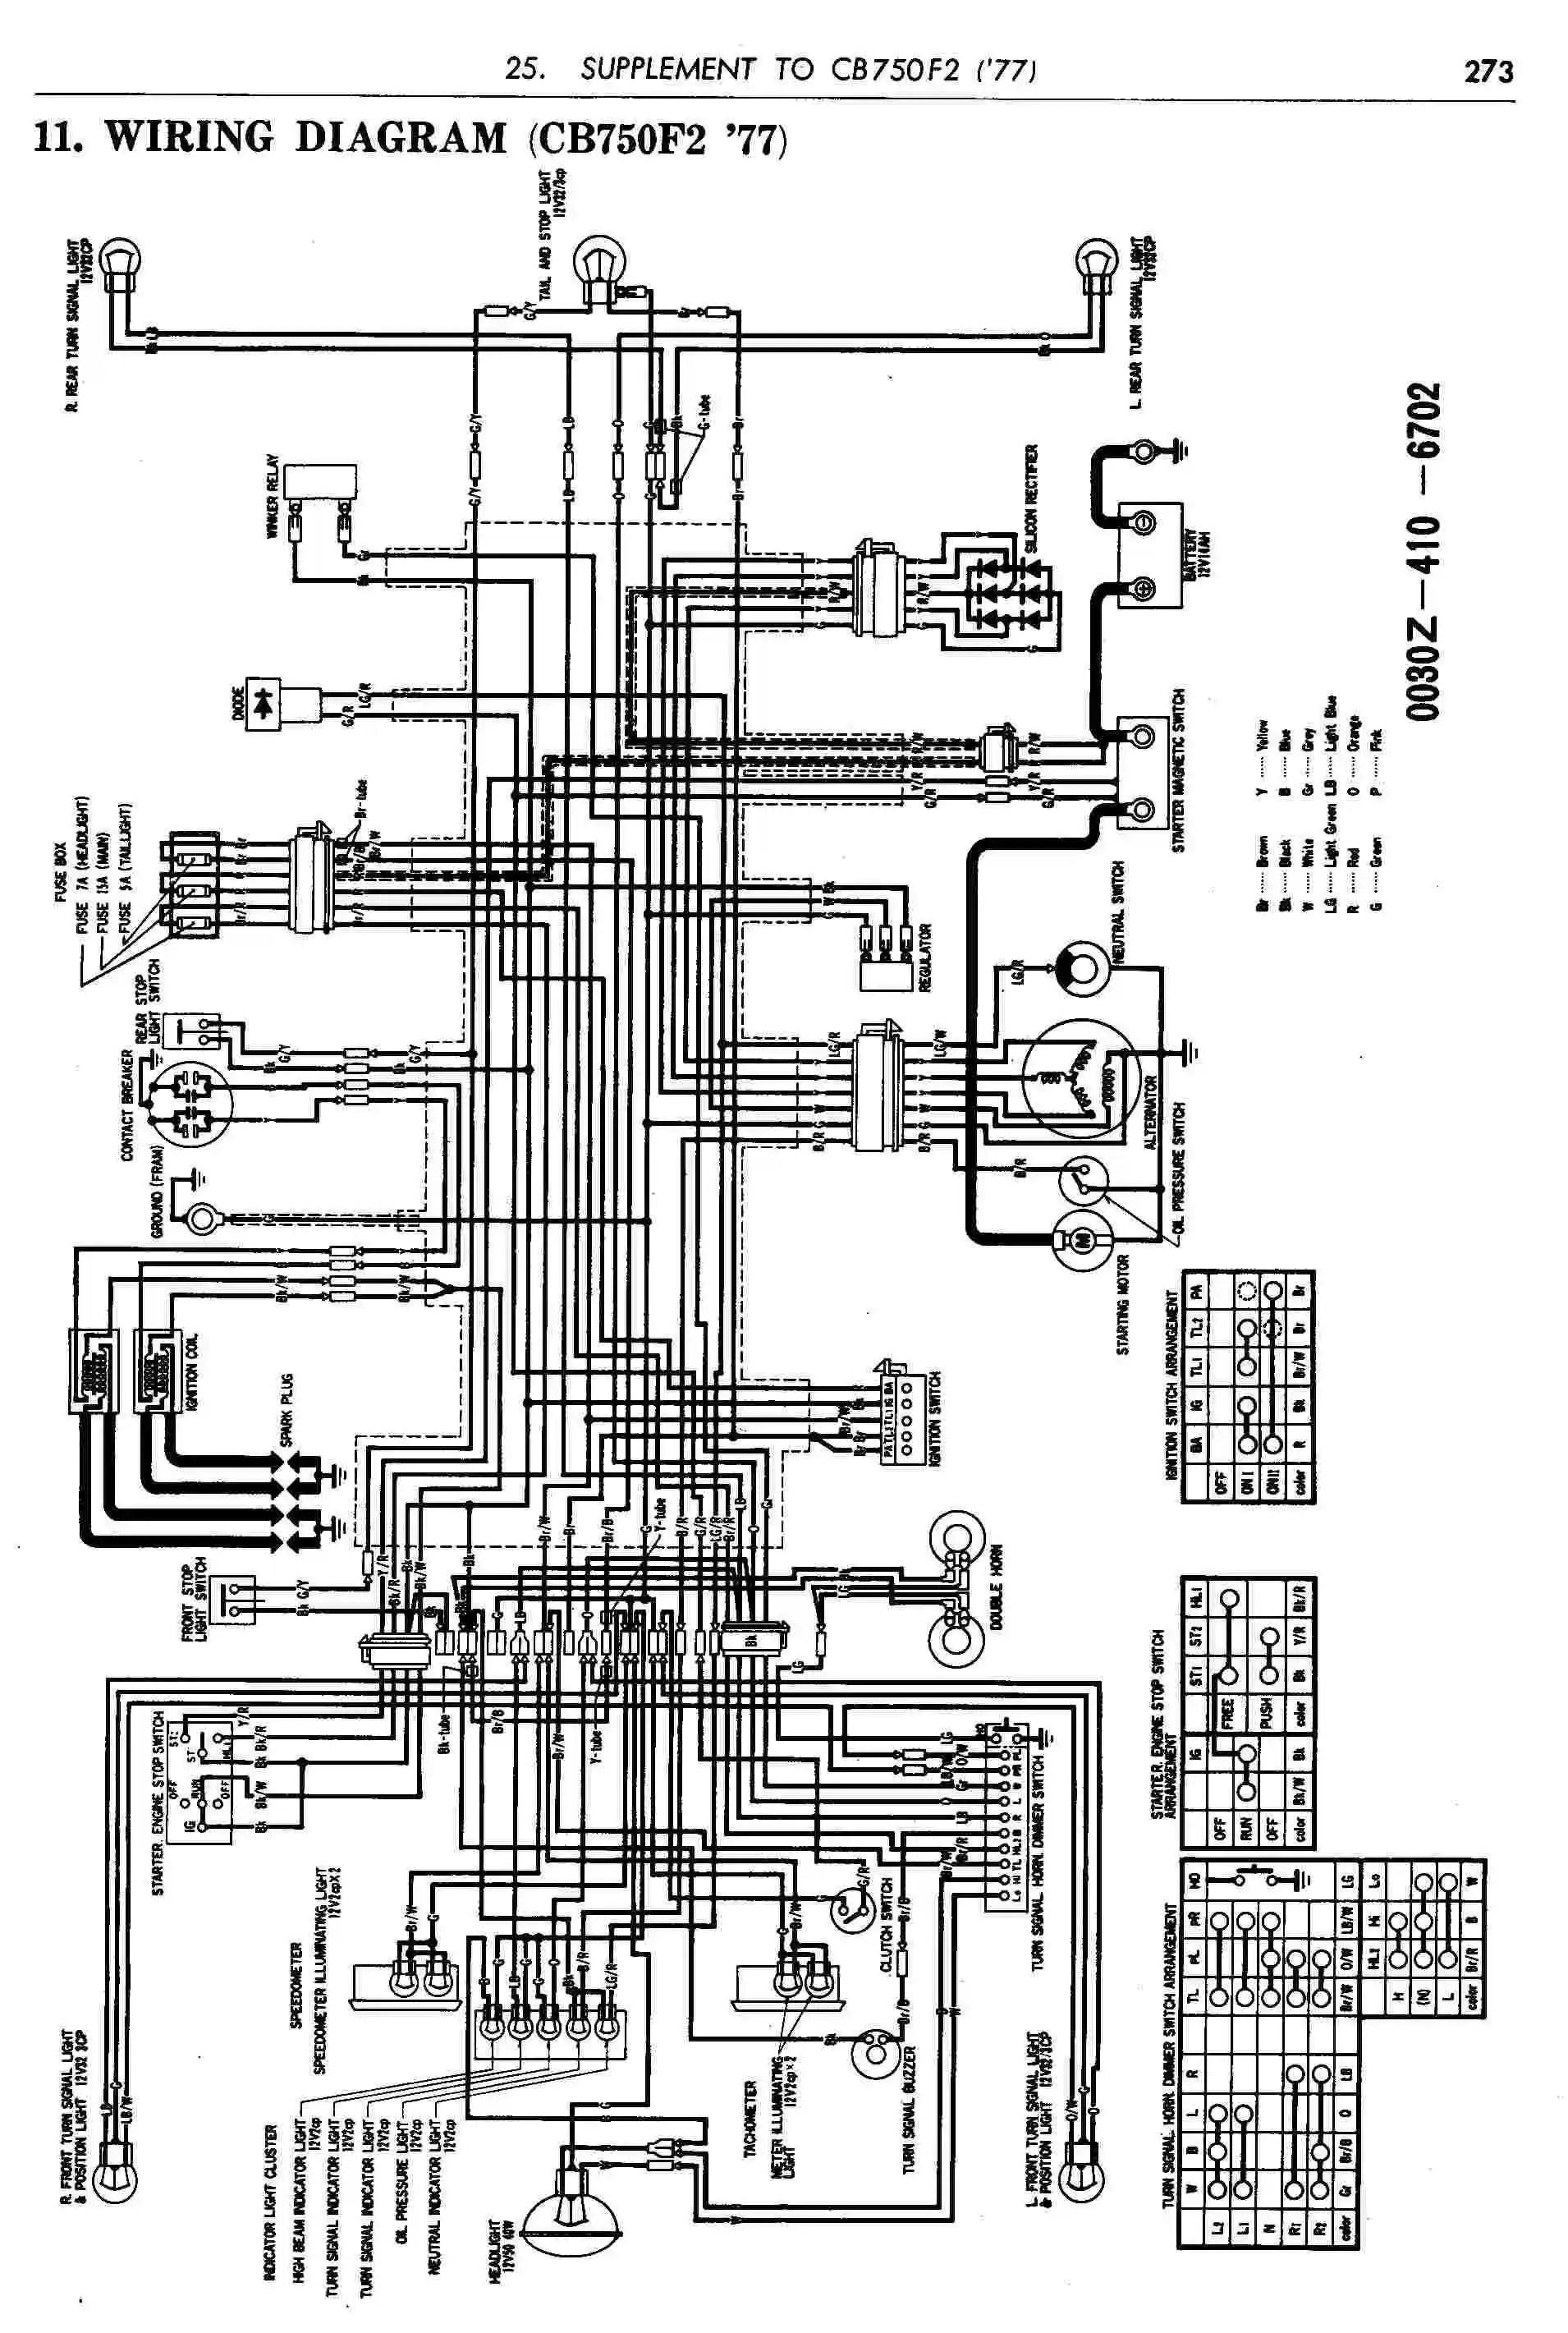 hight resolution of 1976 cb 750 wiring diagram wiring diagram